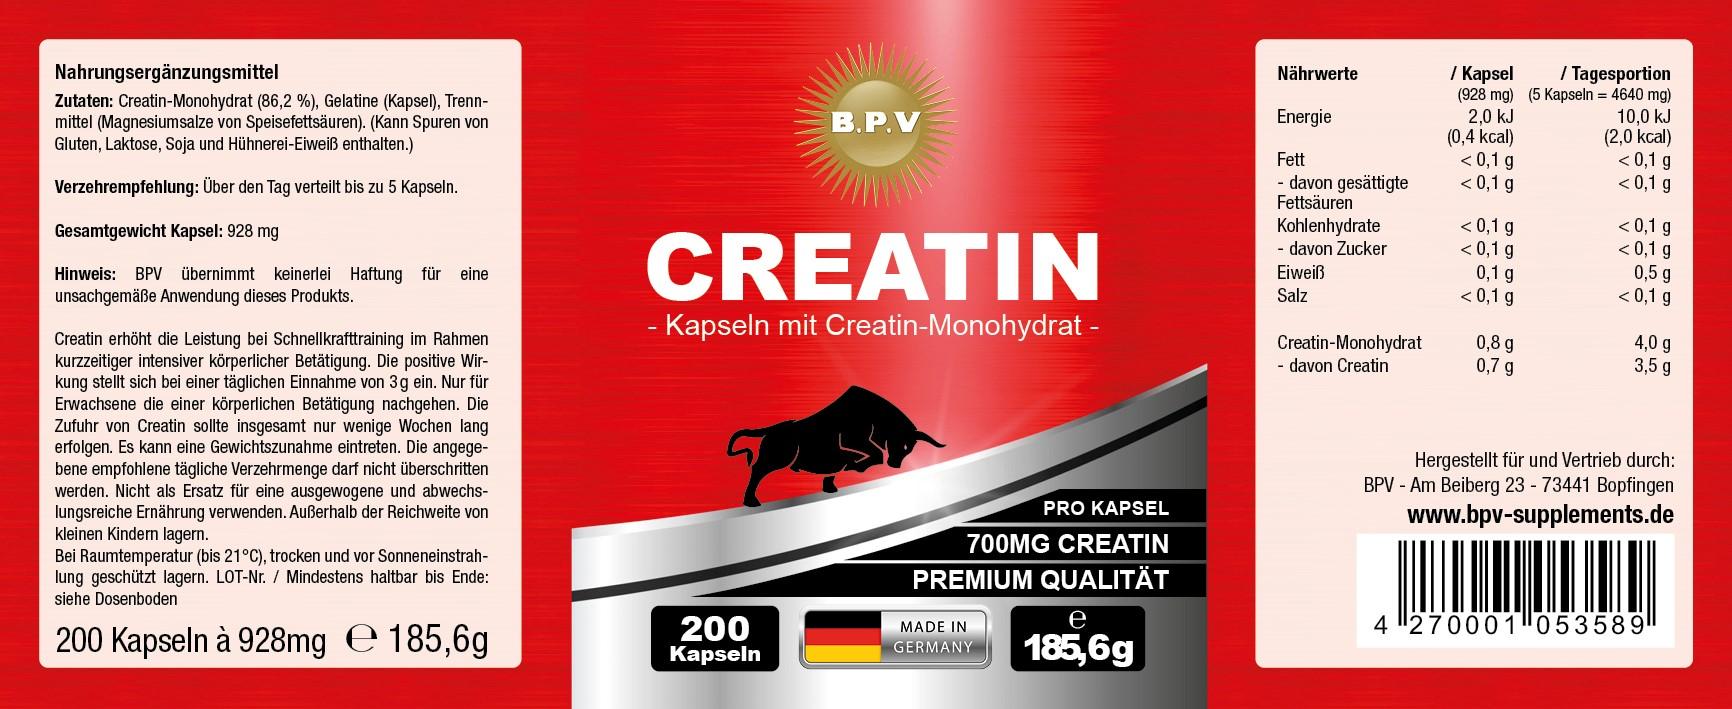 ANSICHT_Creatin-Kapseln_200Stuck_WL